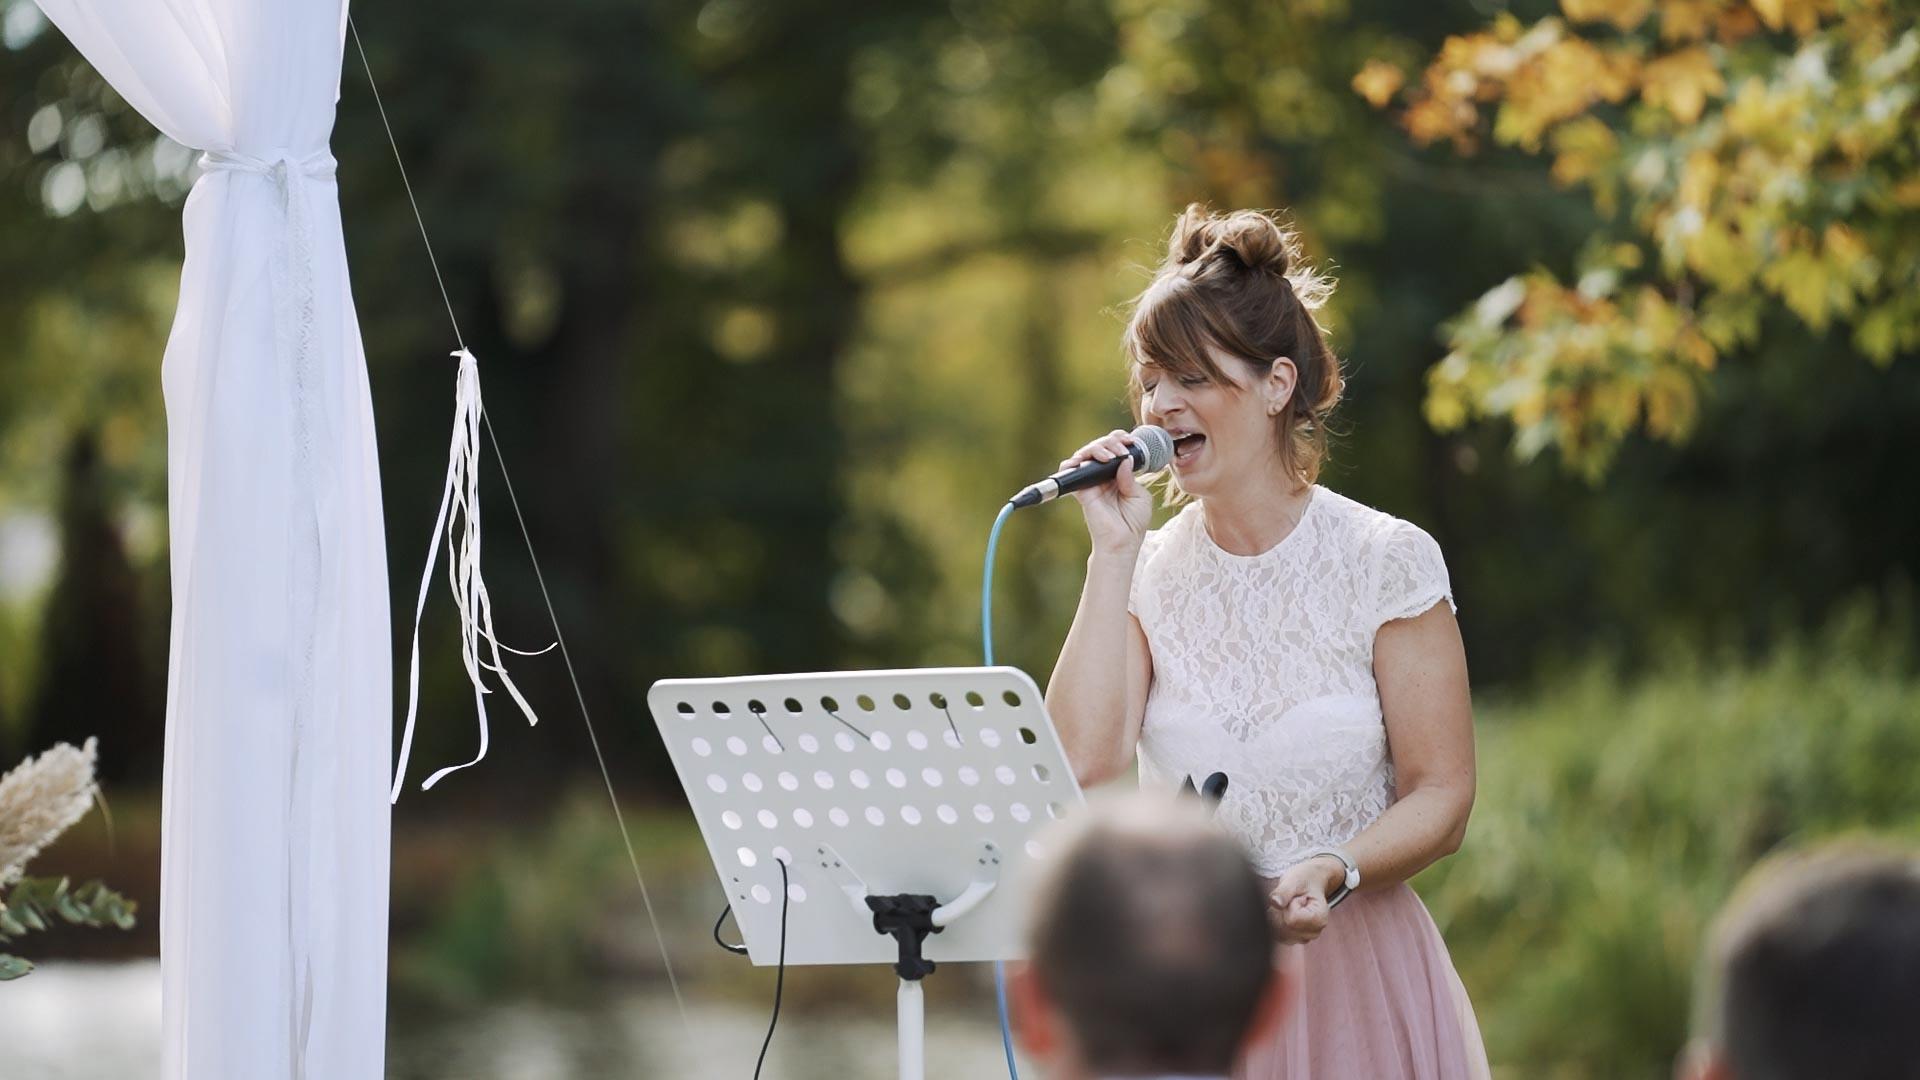 Pascal & Jenny Hochzeitsfilm Schloss Vettelhoven Videograf Hochzeit Filmemacher 044